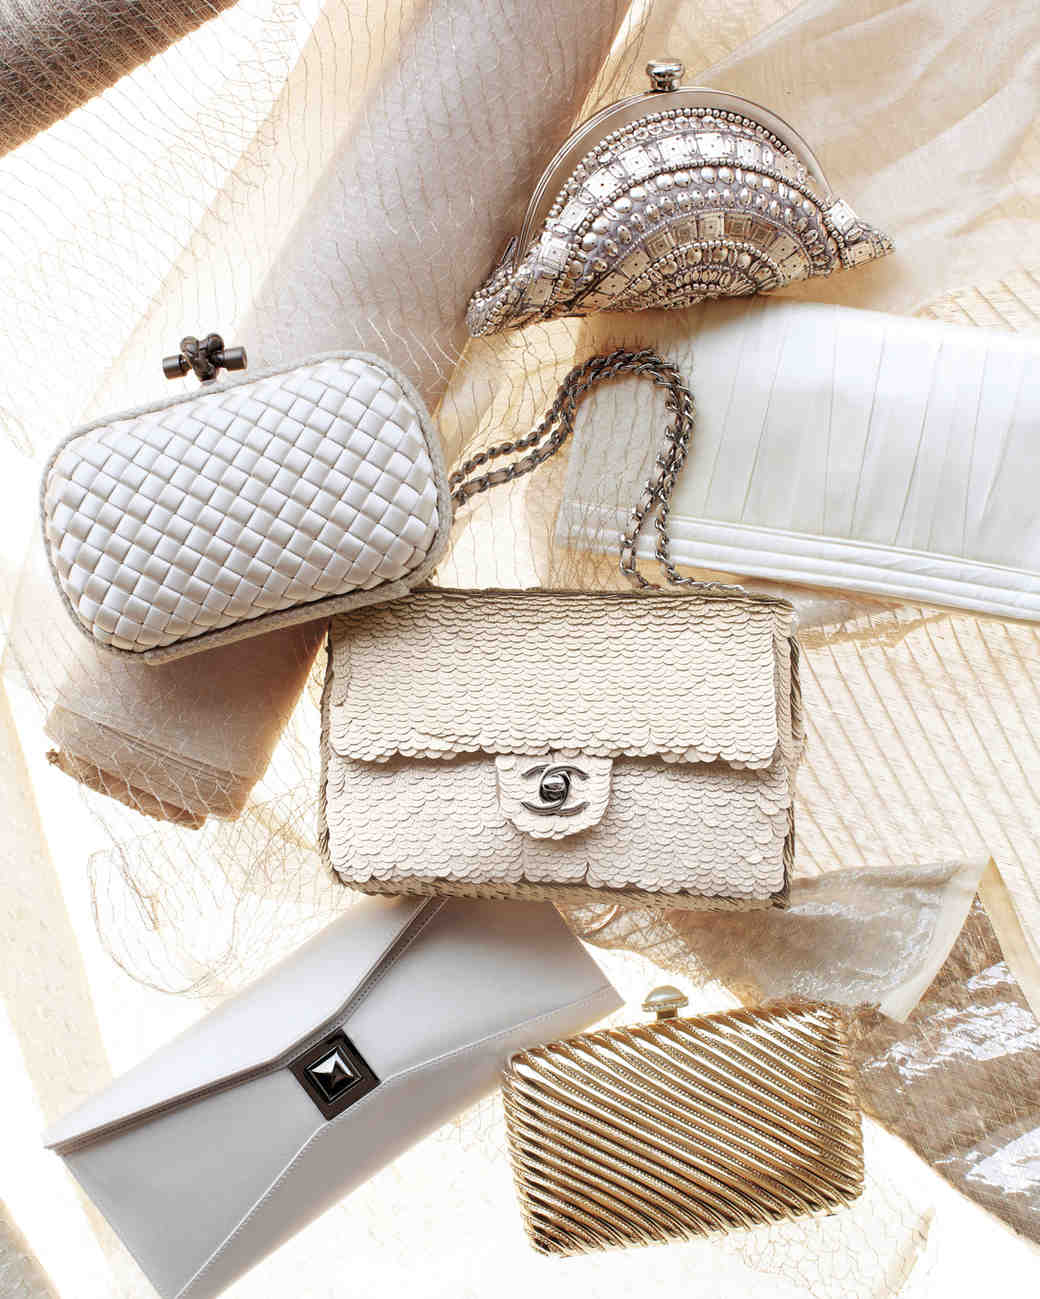 accessories-handbags-mwd108762.jpg